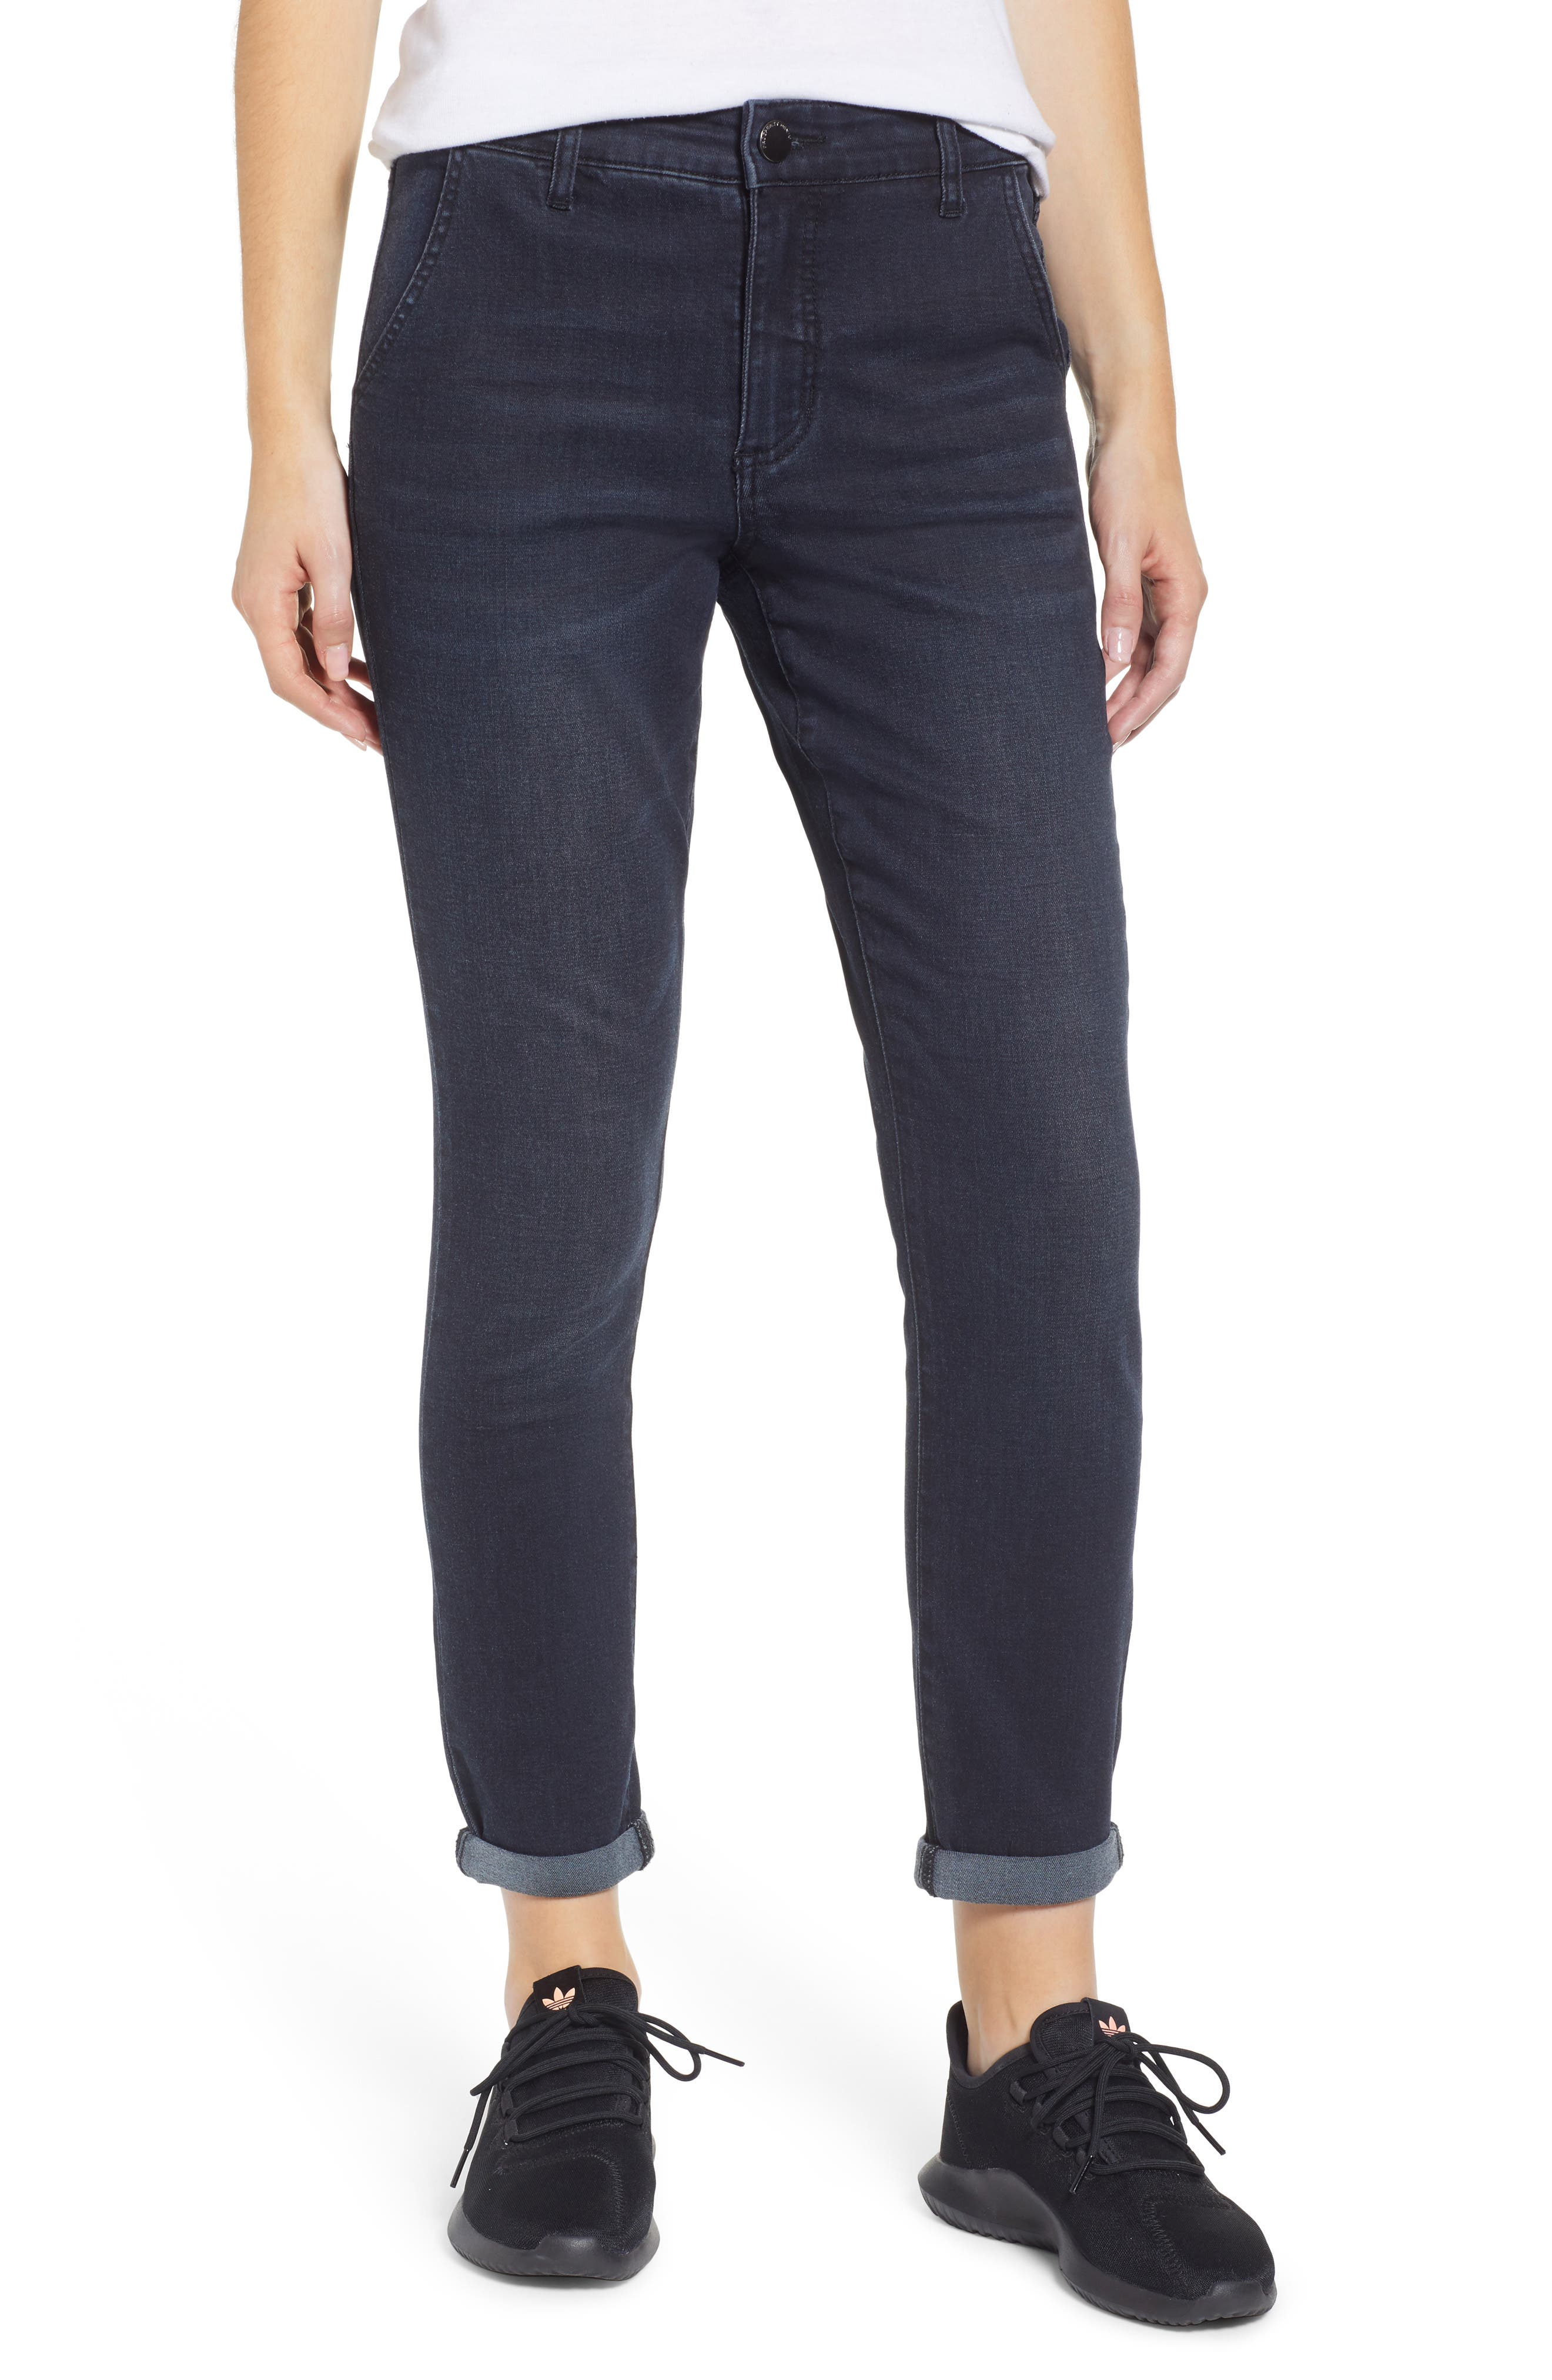 PROSPERITY DENIM High Waist Ankle Boyfriend Jeans, Main, color, ROCKER WASH